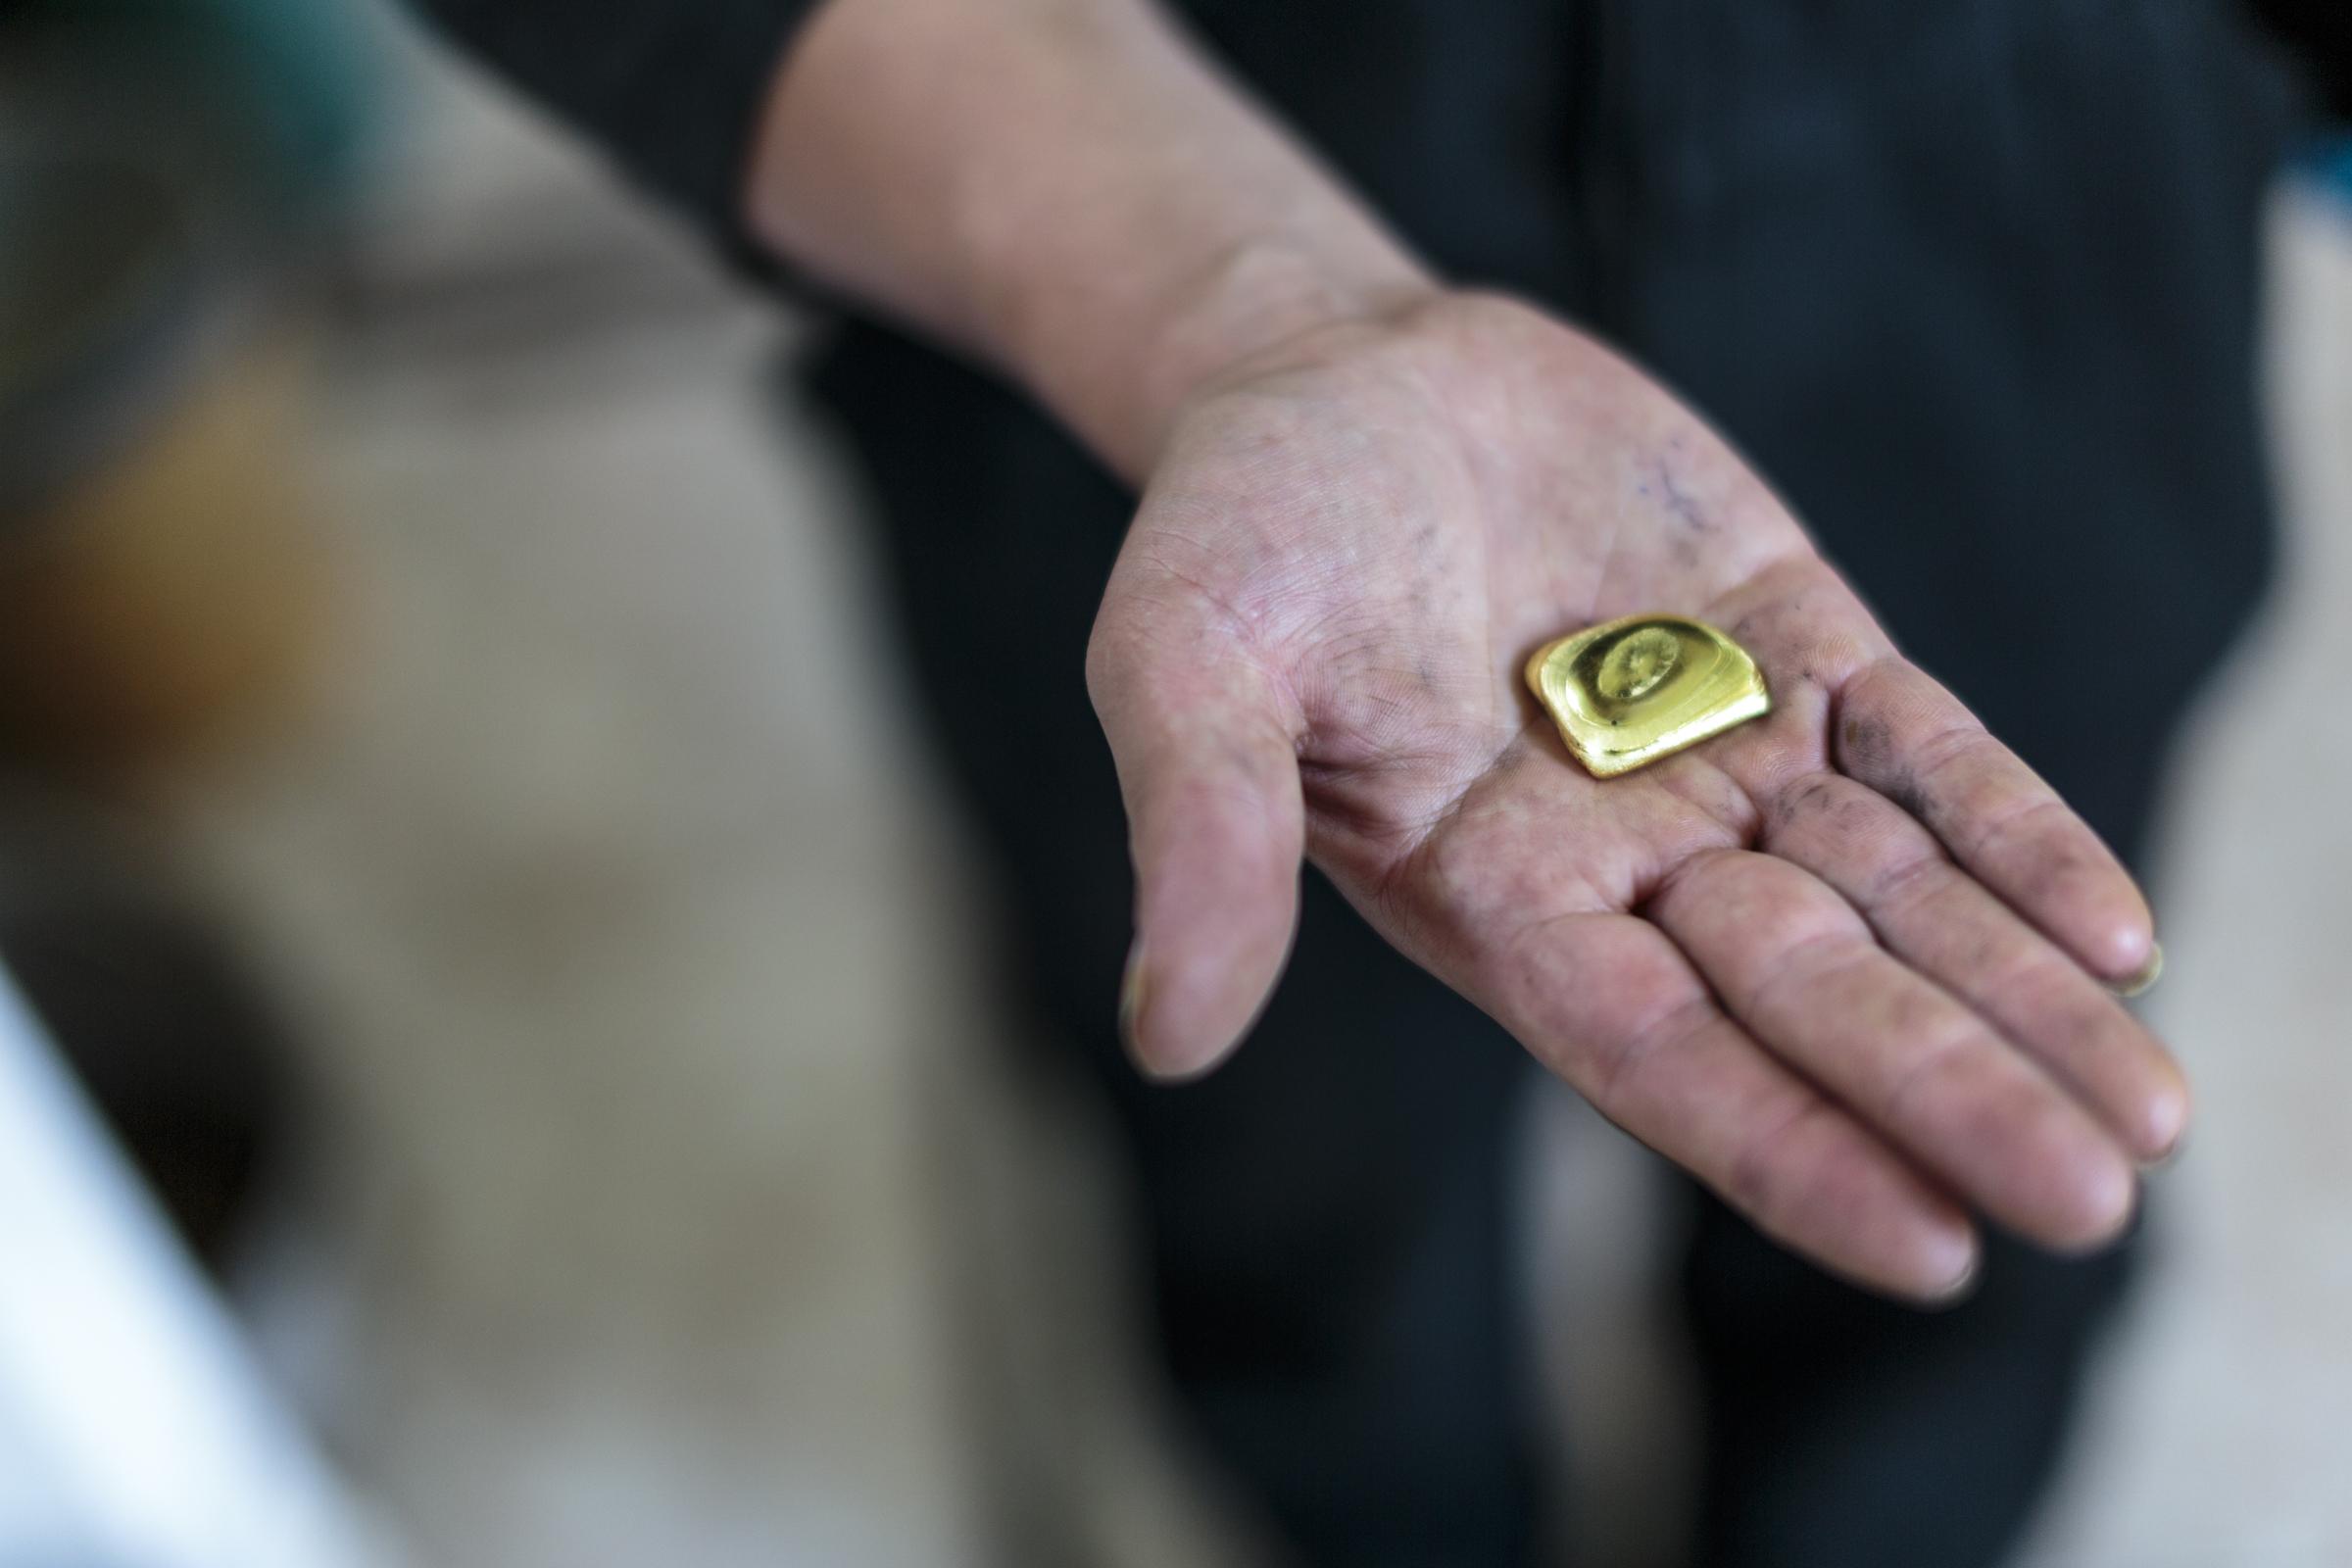 Dorothee Rosen Gold in Hand Copia de 1234 (c) Manuela Franco Fairmined Gold